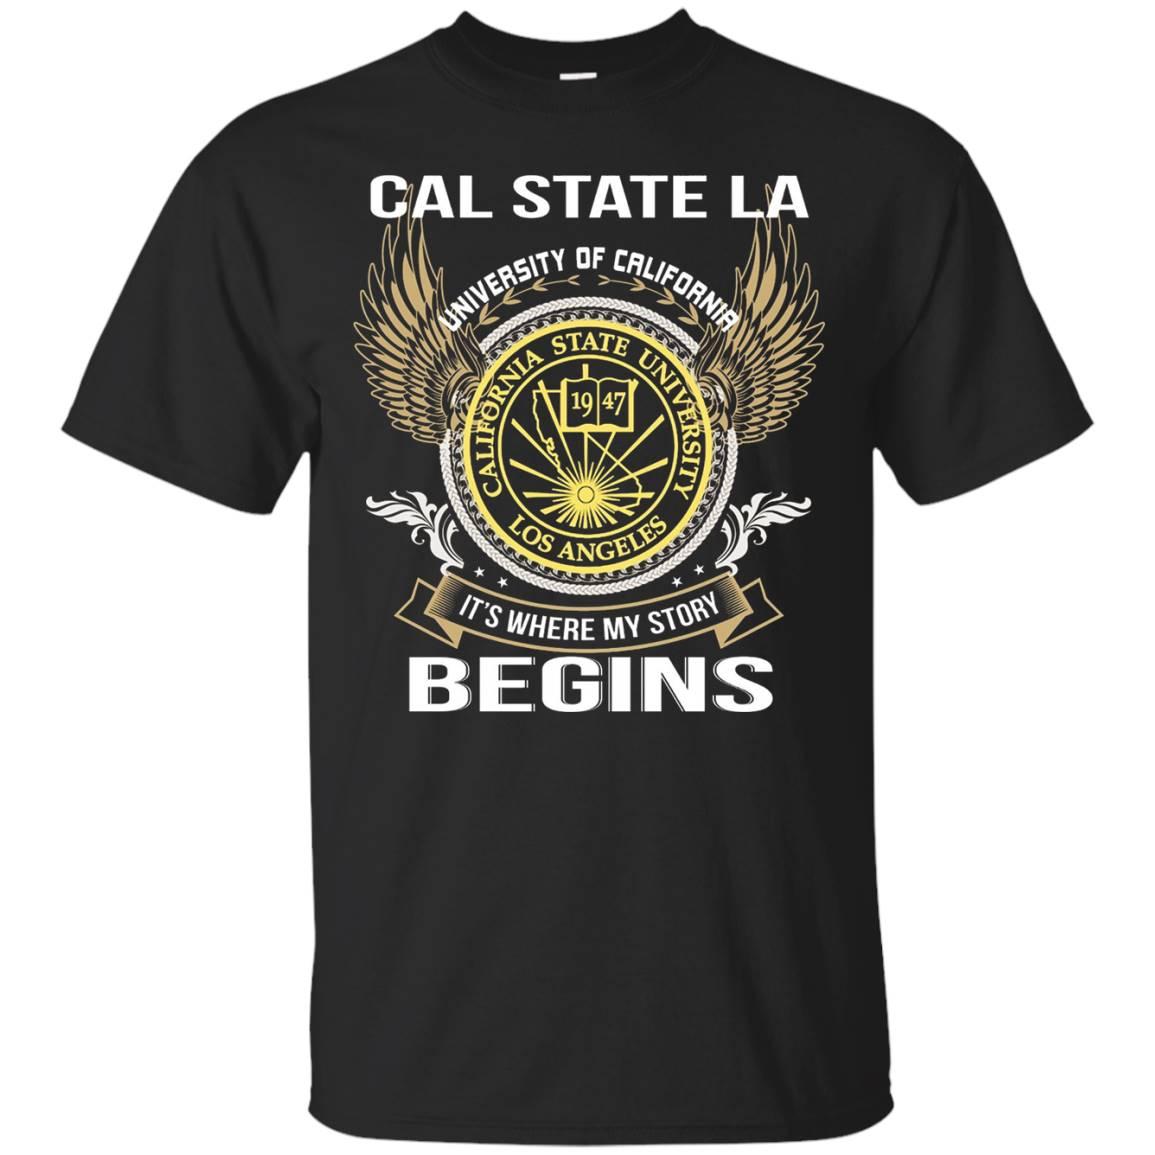 Cal State LA student T-Shirt